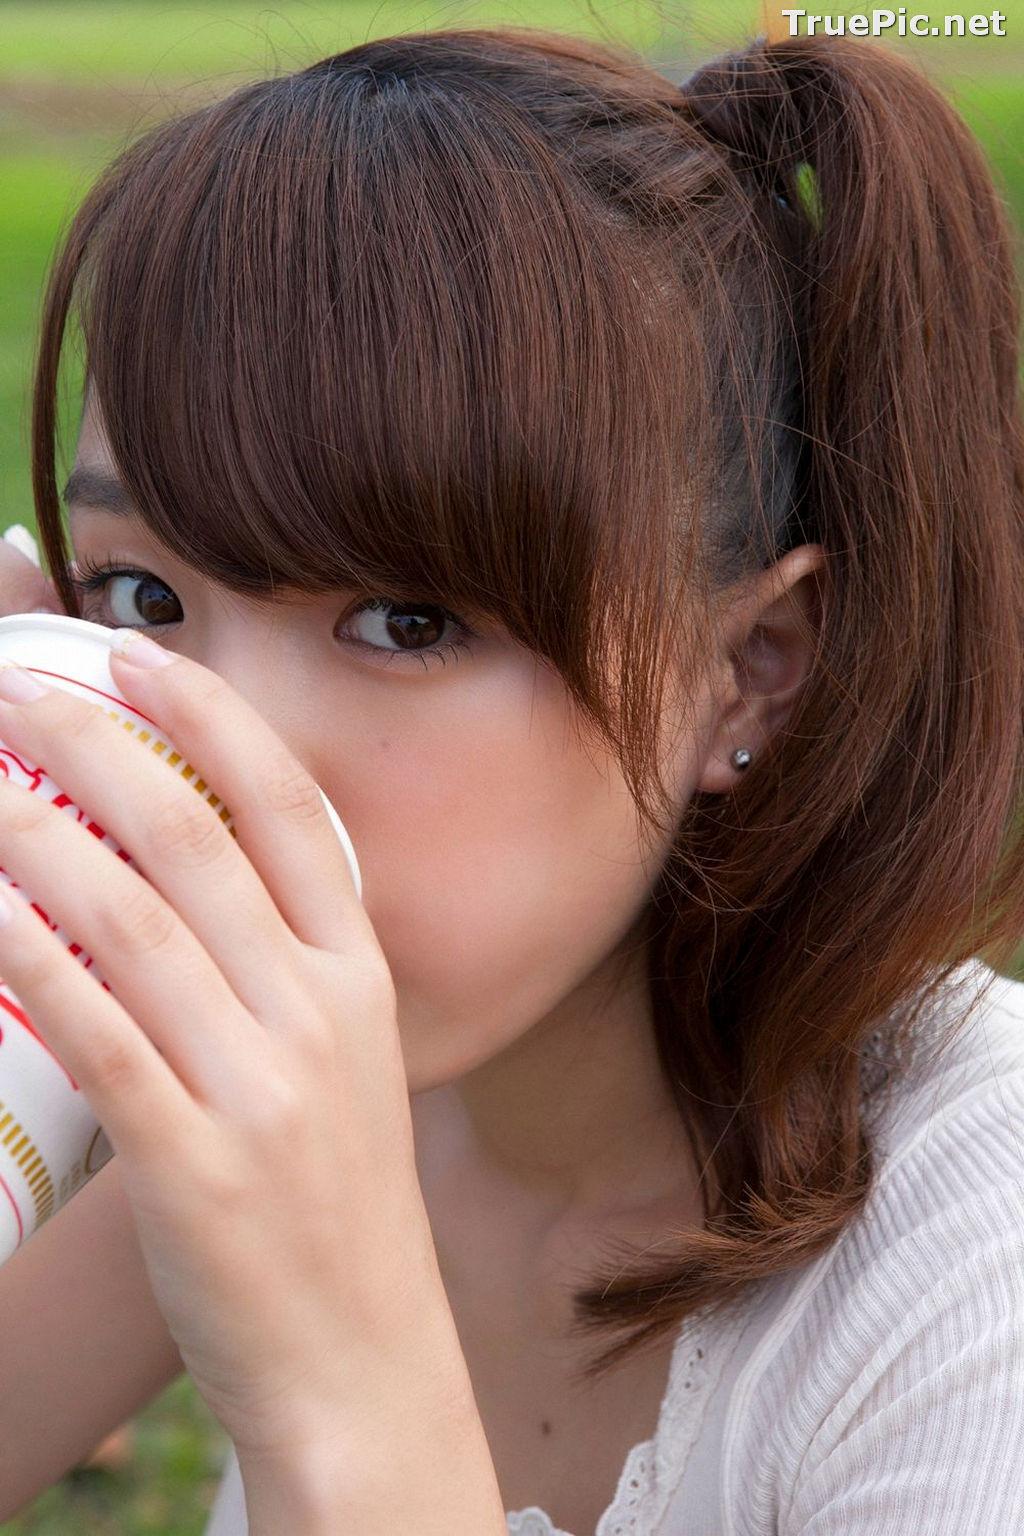 Image [YS Web] Vol.465 – Japanese Model Ai Shinozaki – Mermaid of Love Photo Album - TruePic.net - Picture-5